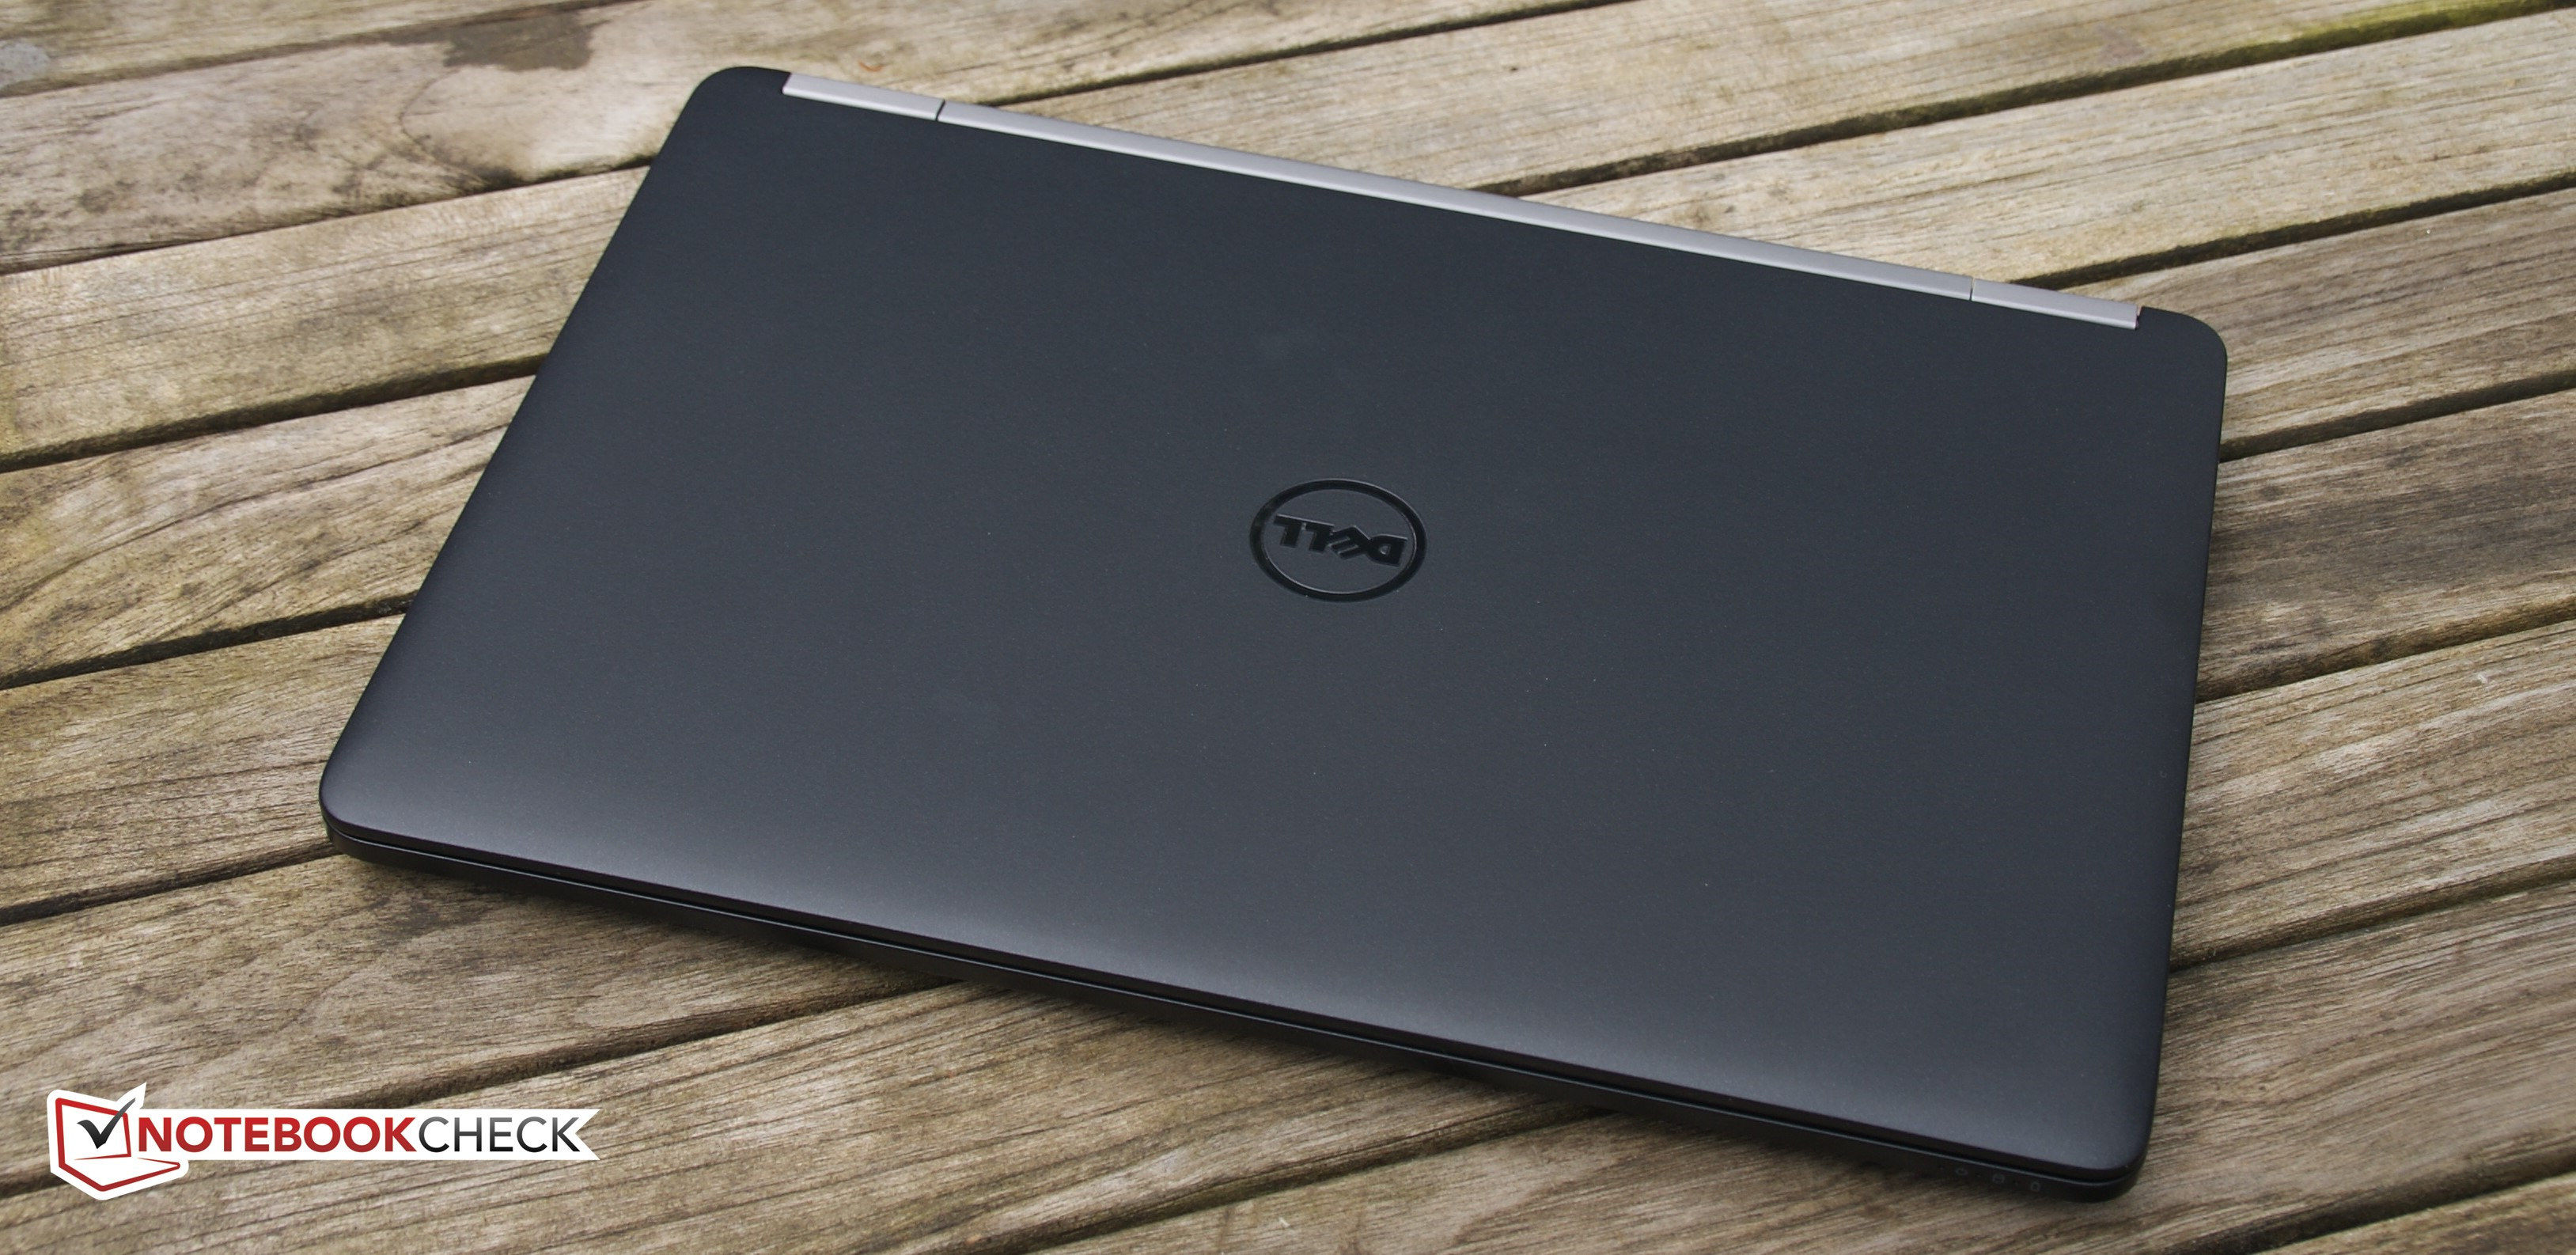 Dell Latitude 12 E7270 Notebook Review - NotebookCheck net